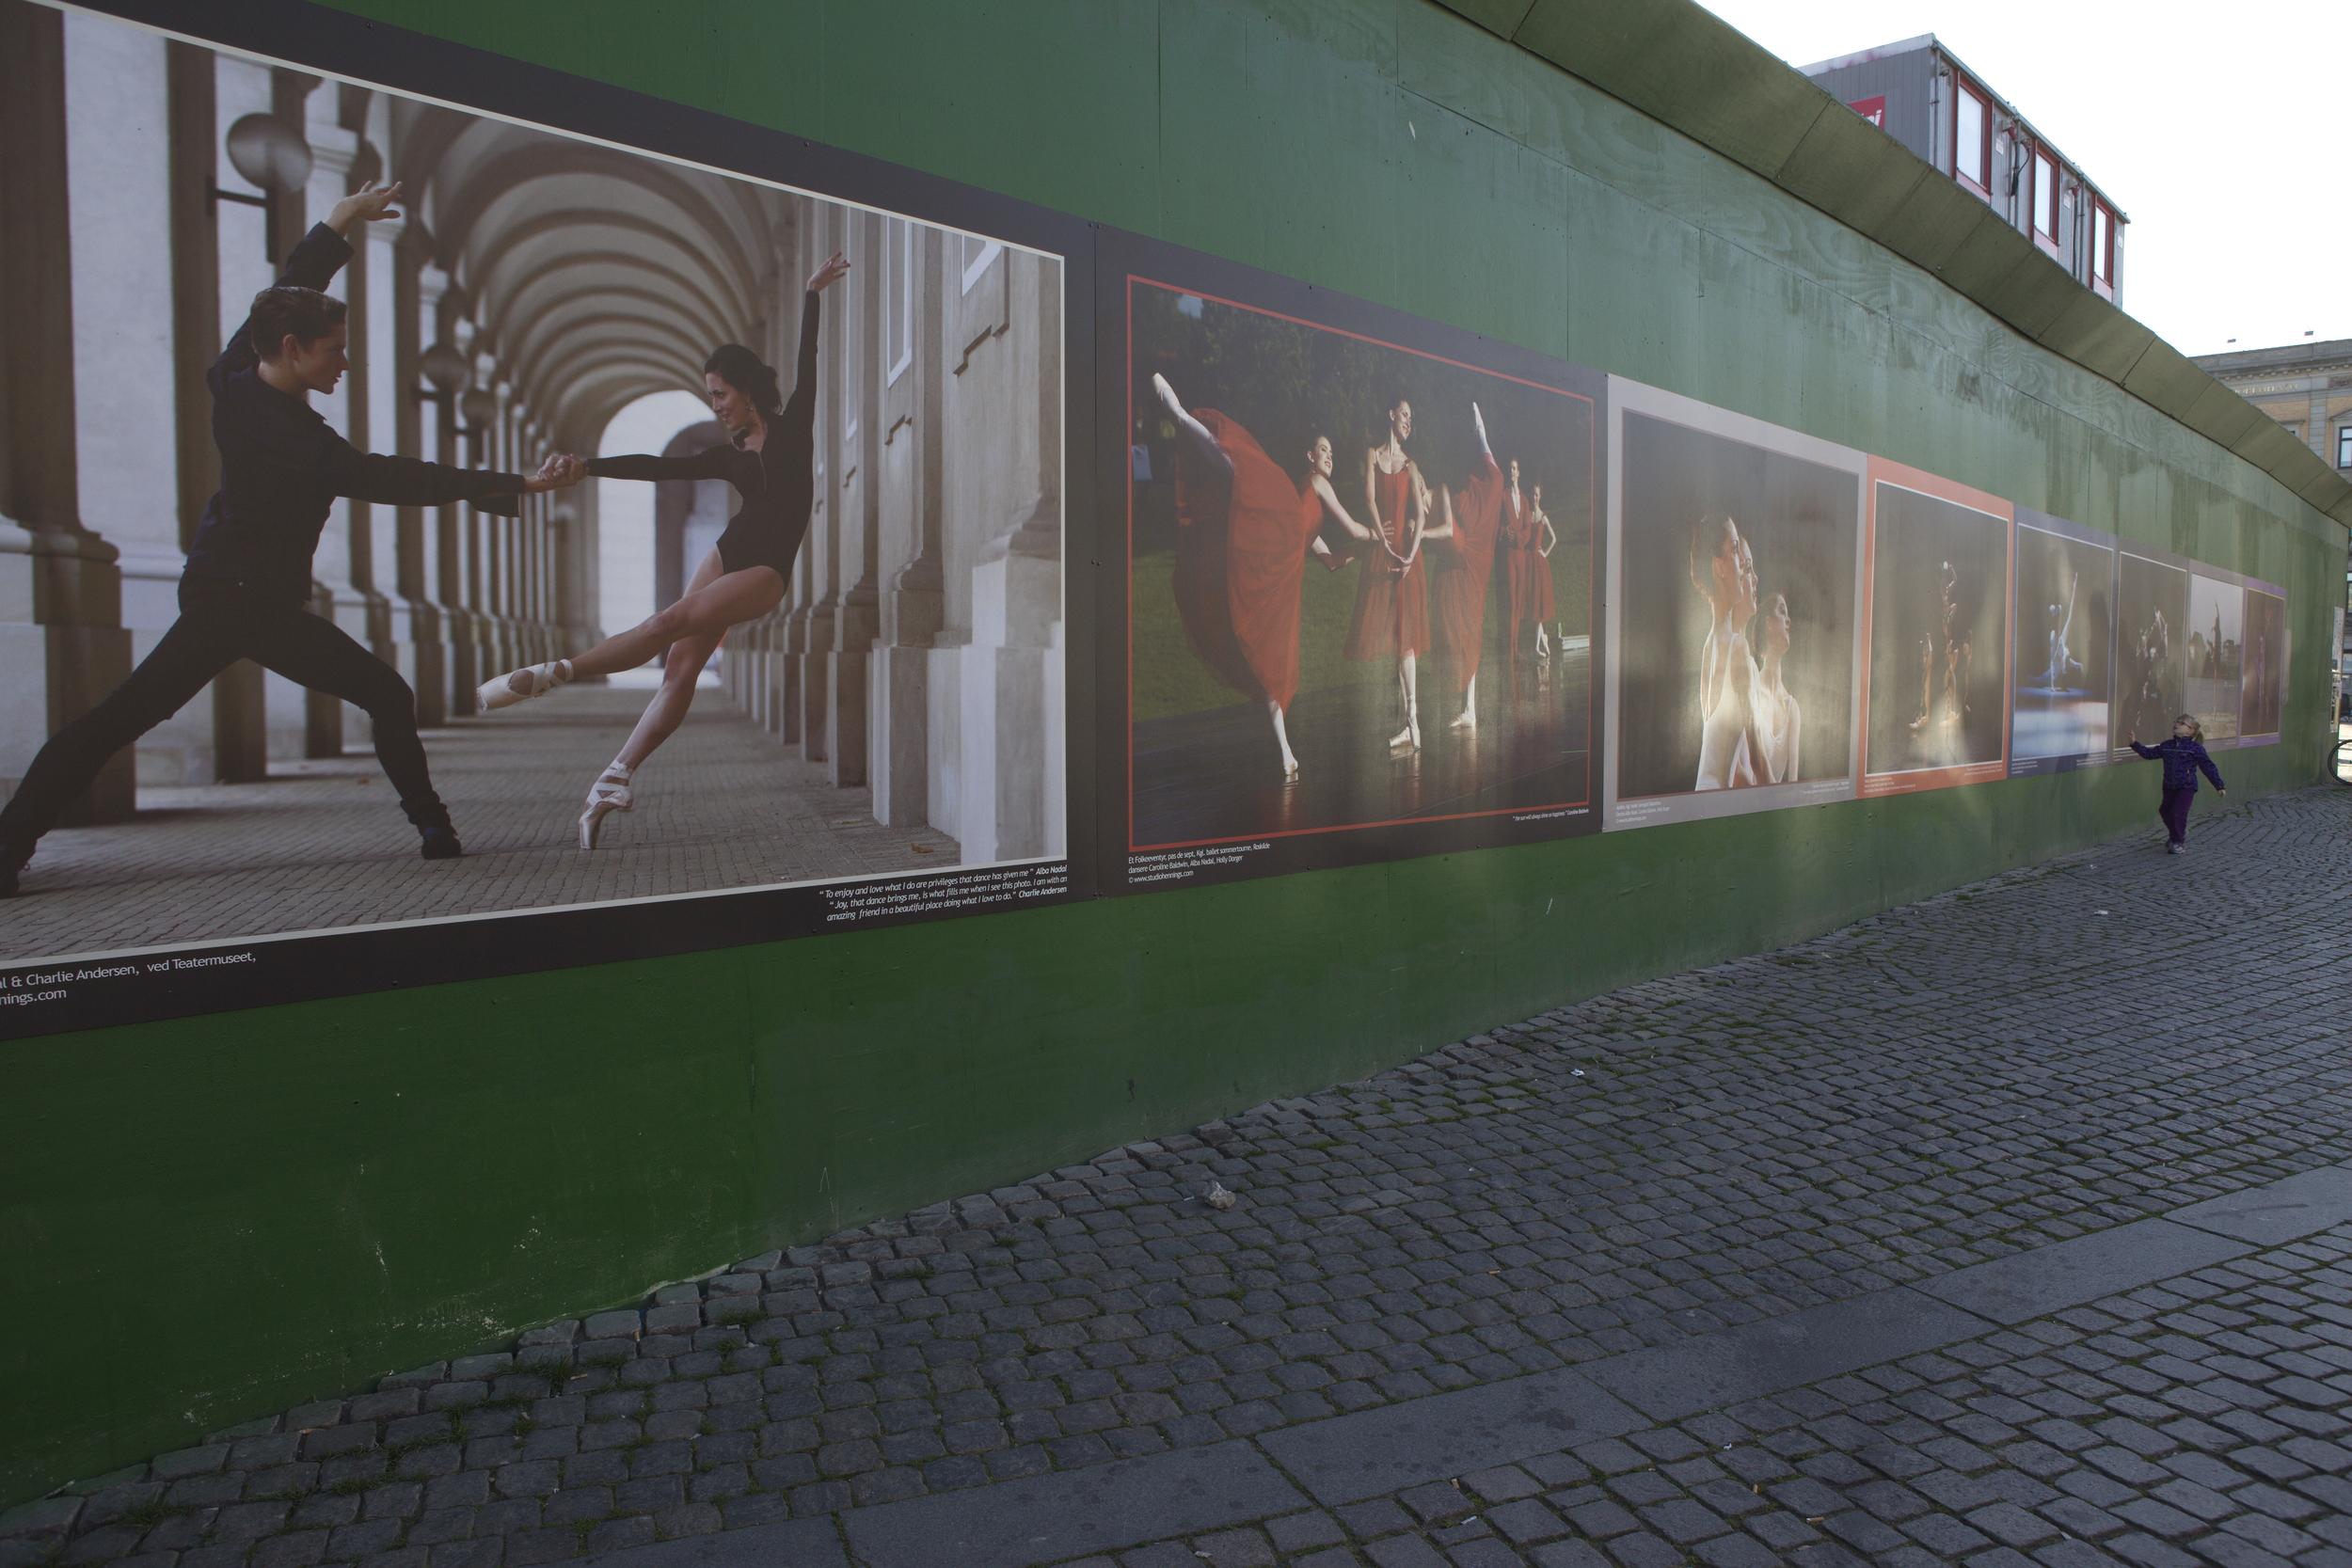 Kgs. Nytorv 24 meters MEGA poster